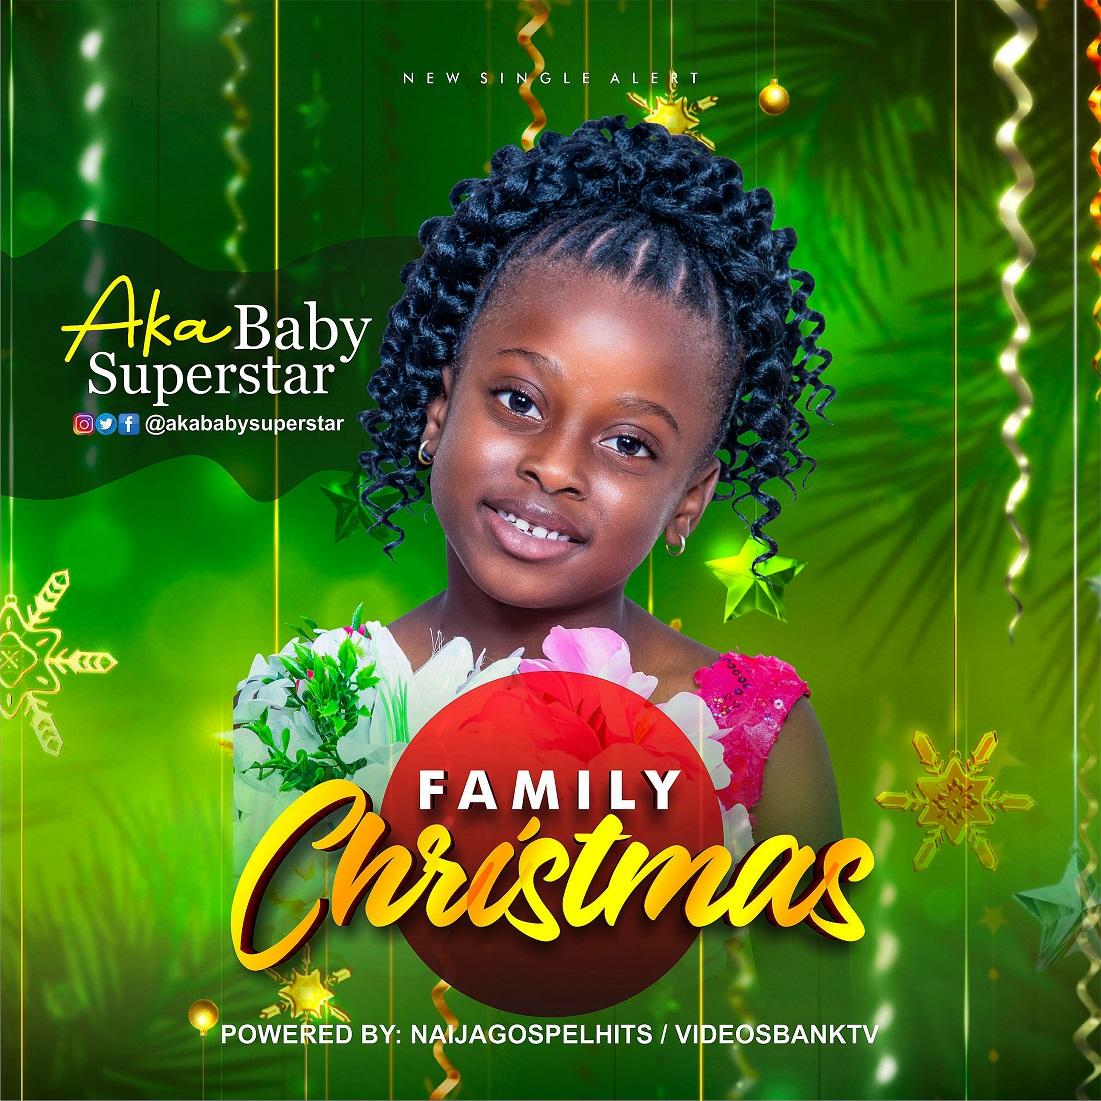 Akababy Superstar - Family Christmas